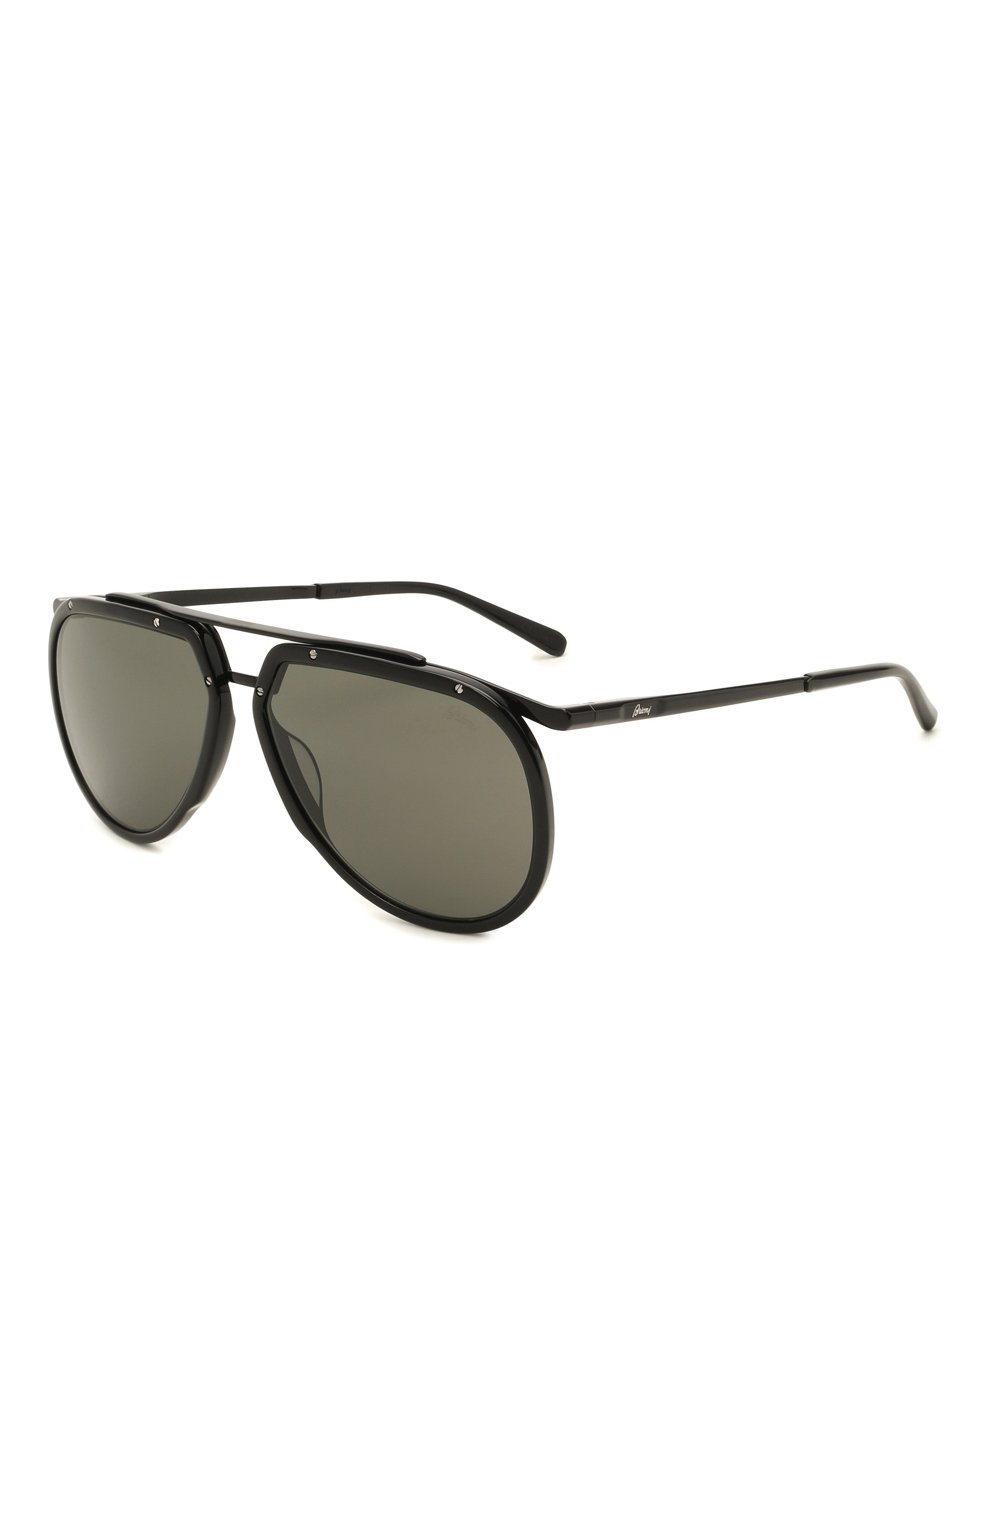 Мужские солнцезащитные очки BRIONI черного цвета, арт. 0DC900/P3ZAC | Фото 1